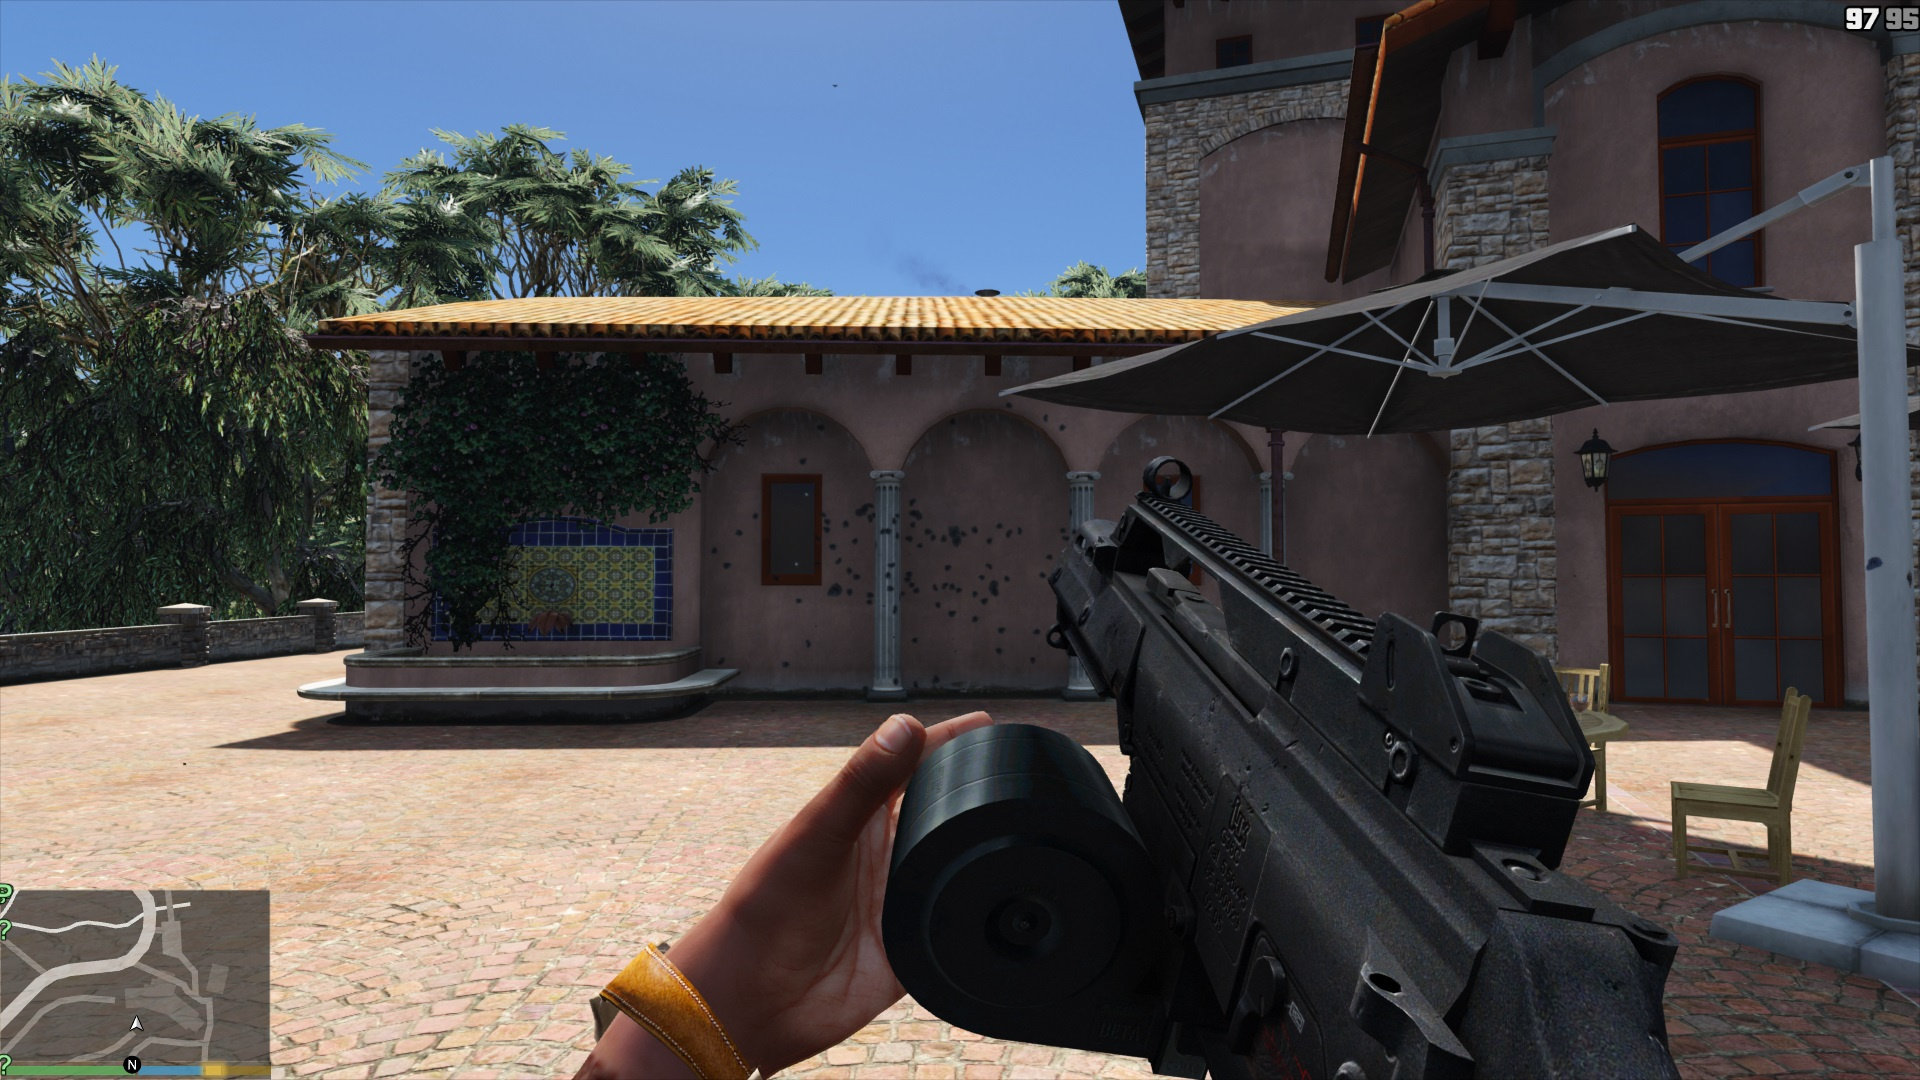 HK G36C - GTA5-Mods com